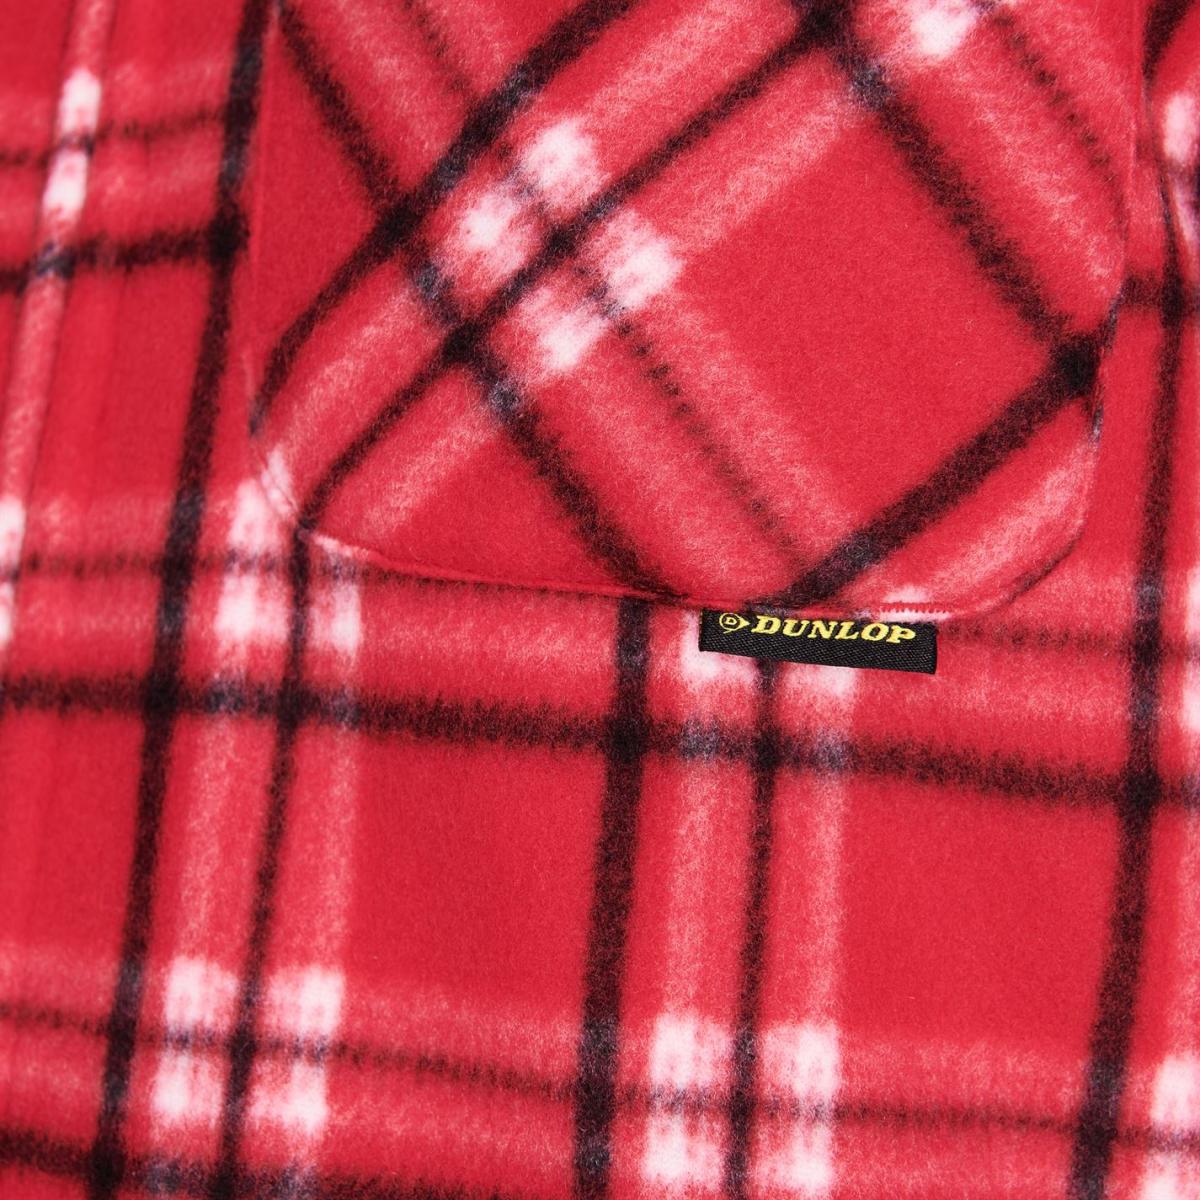 Dunlop Full Zip Kapuzenpullover Kapuzenjacke Herren